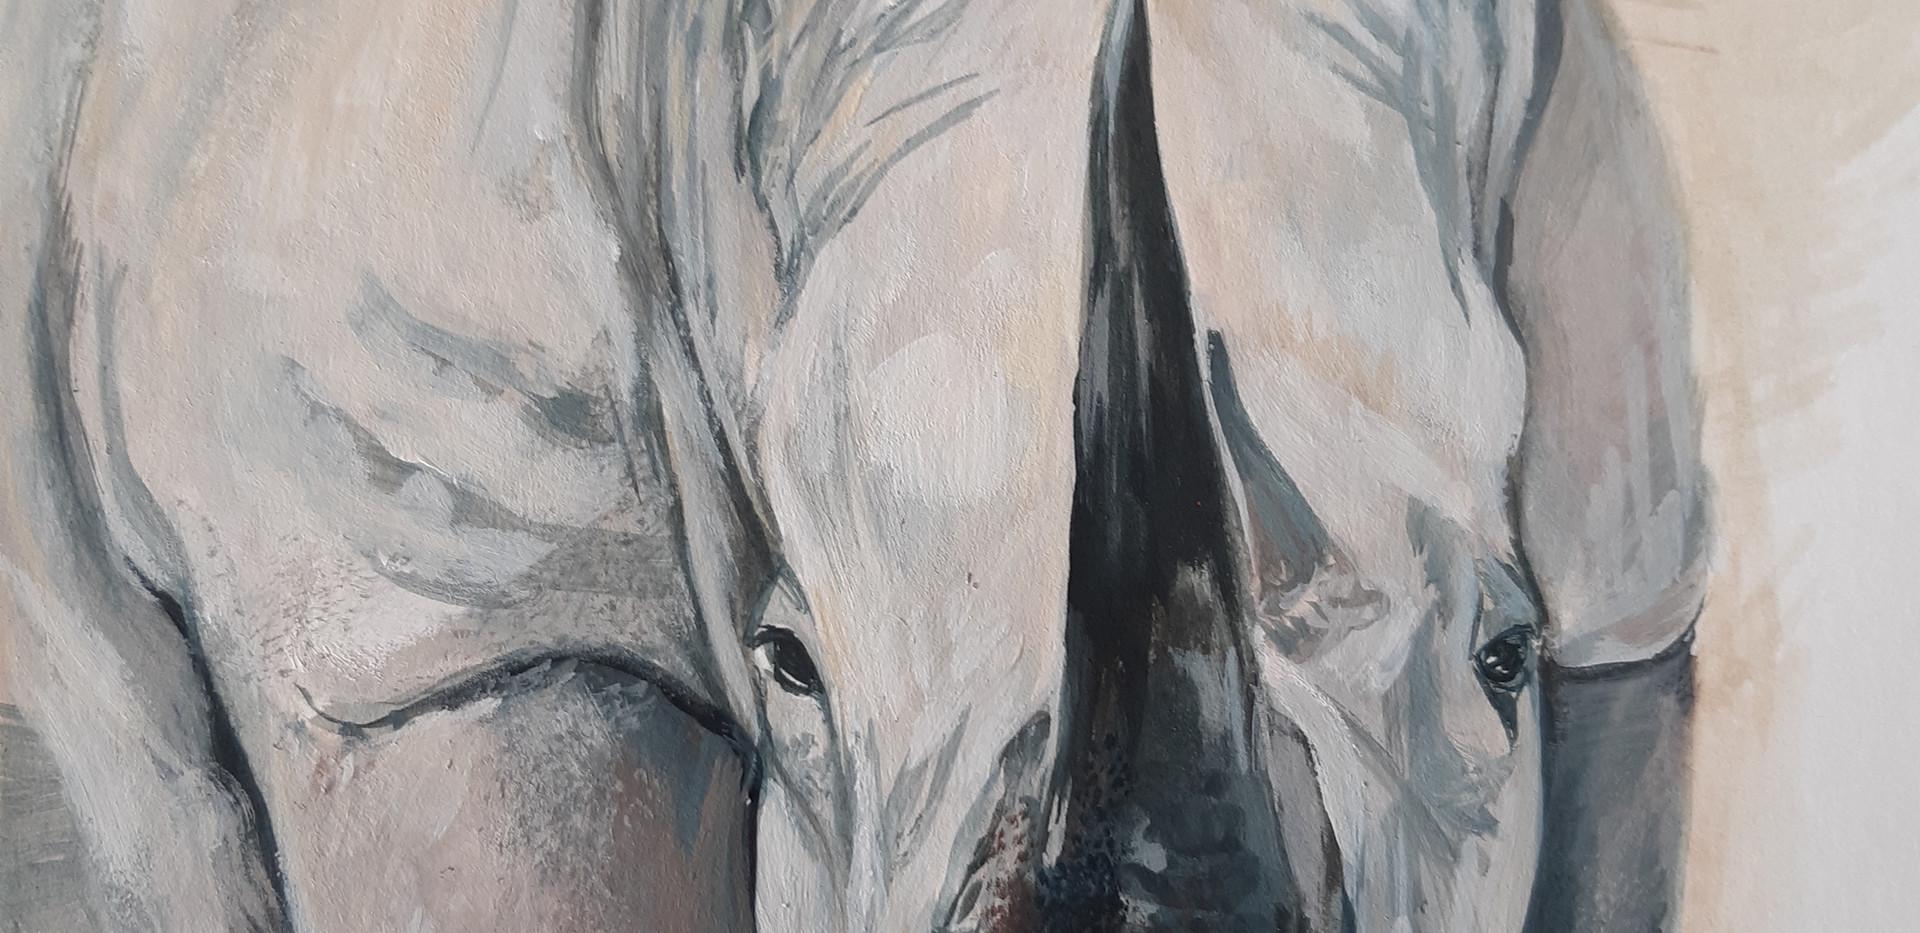 Rhino's nose